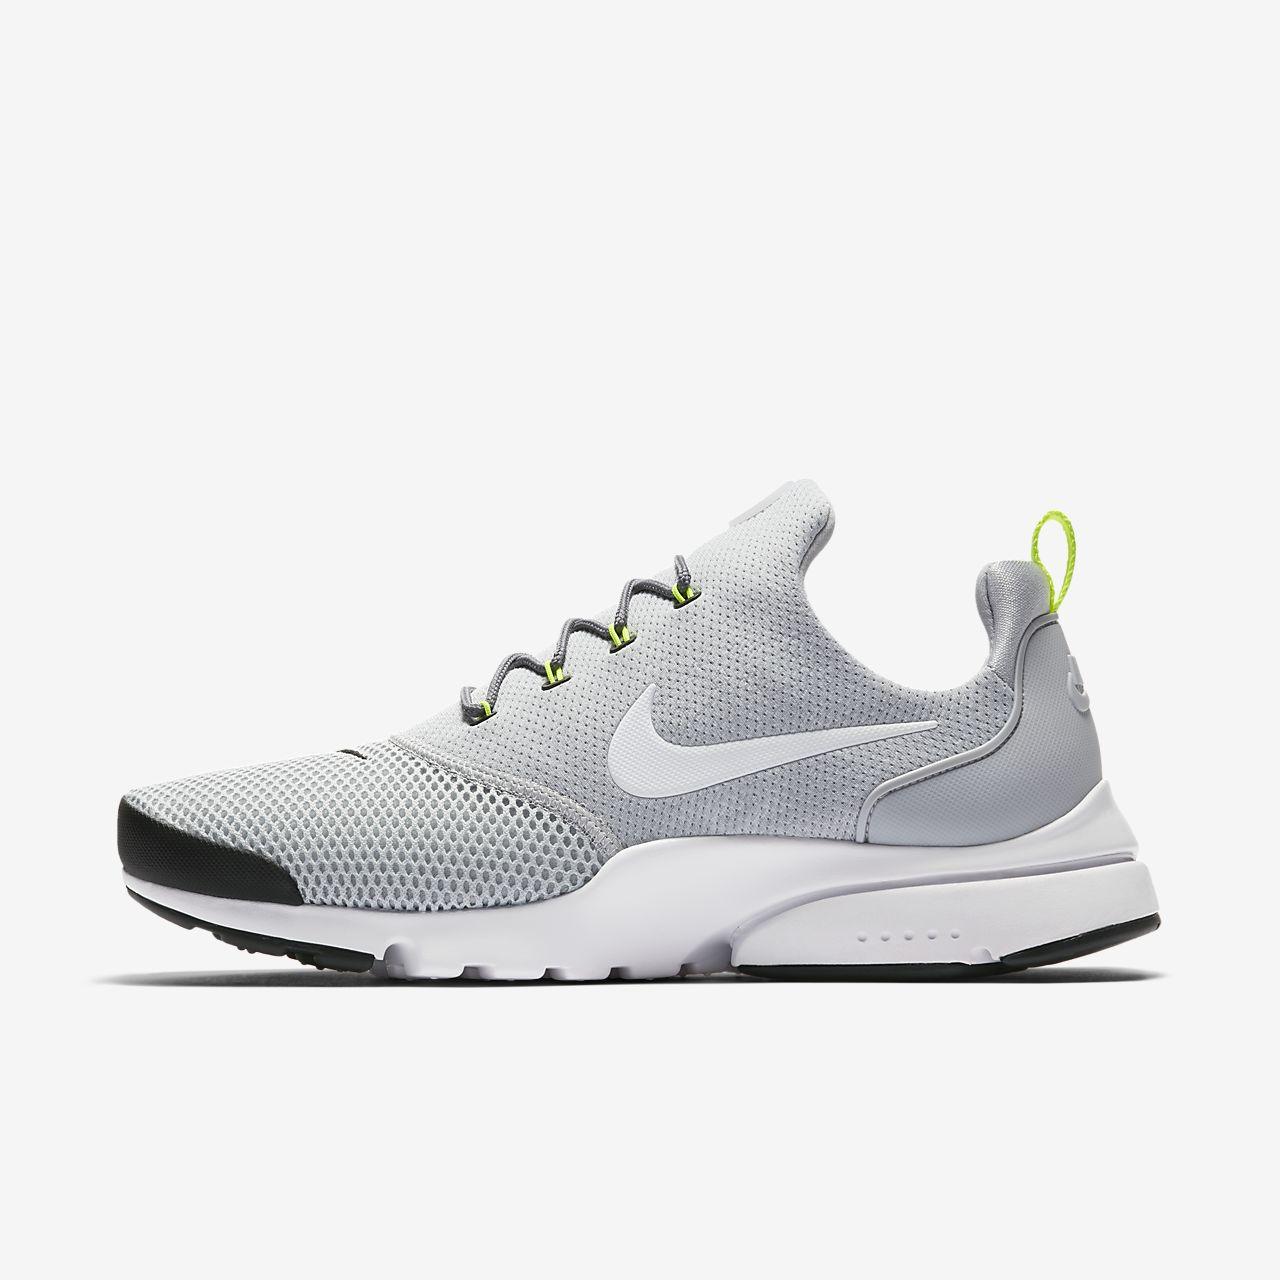 reputable site 819e5 ef008 Homme FR Nike pour Fly Presto Chaussure qx8wHTBIB